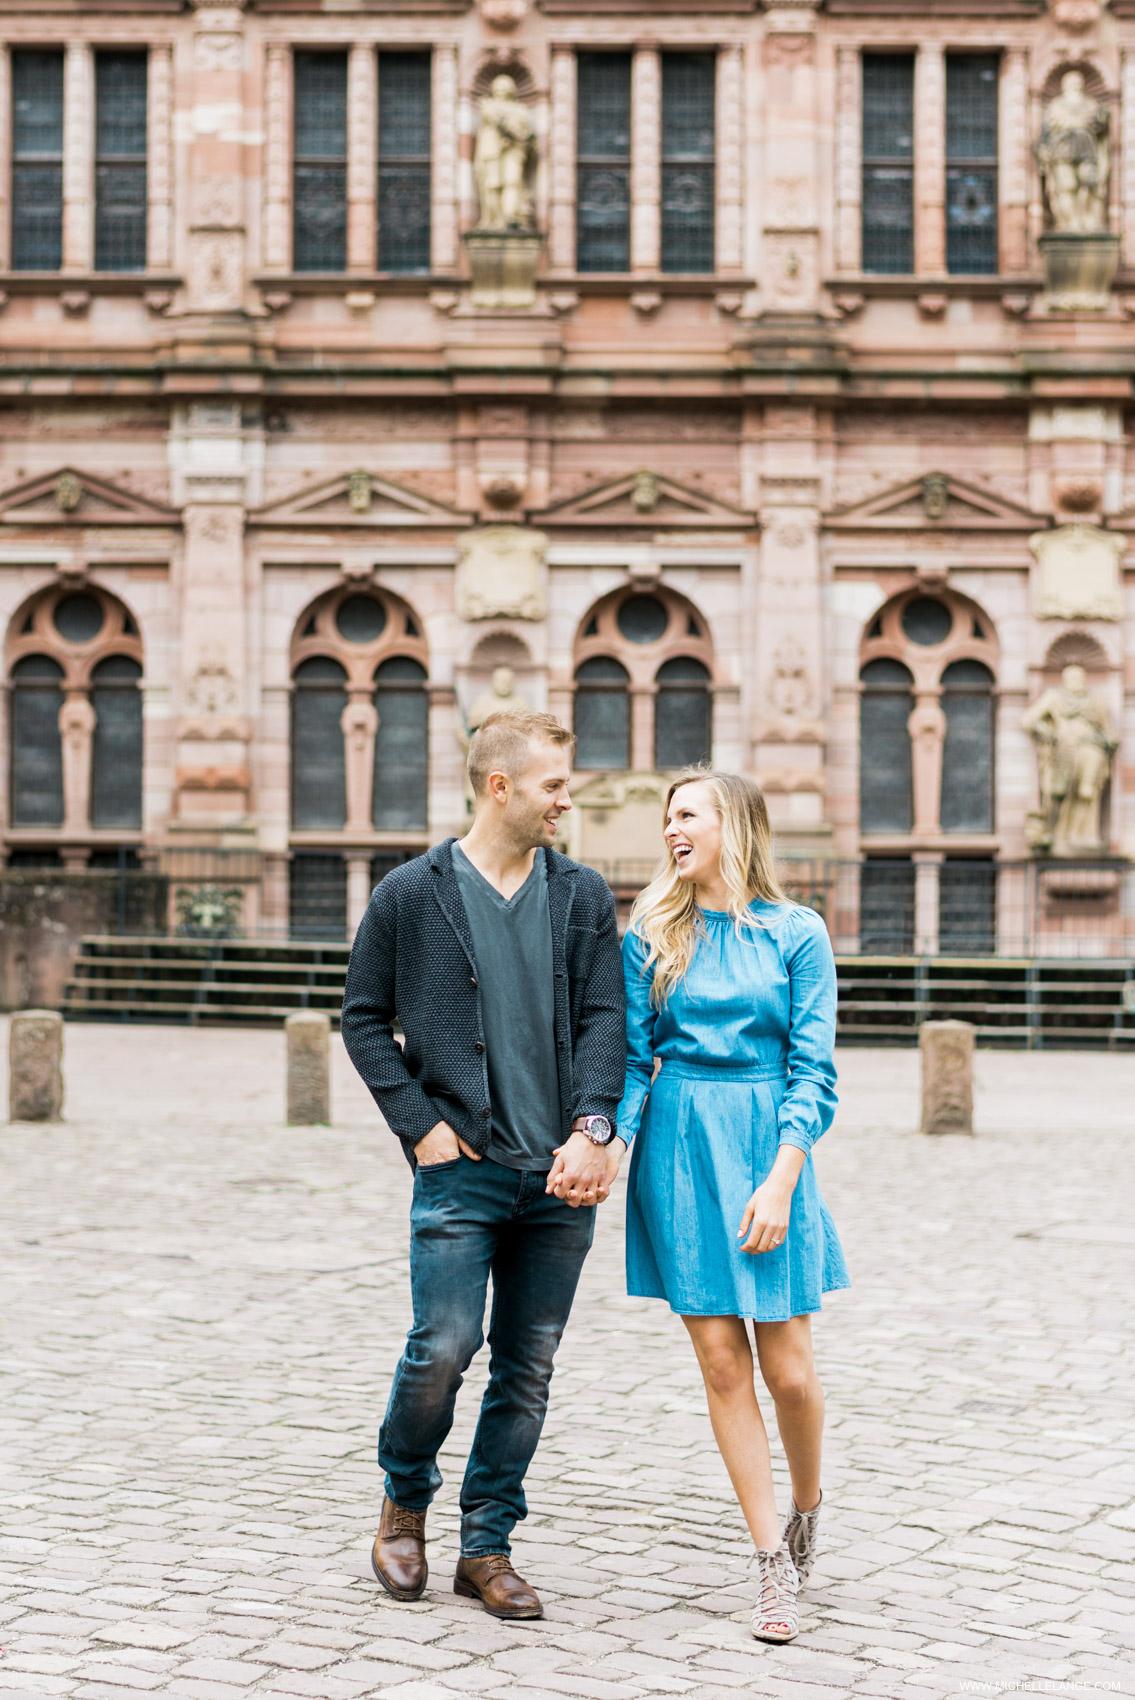 NJ and Destination Engagement and Wedding Photographer